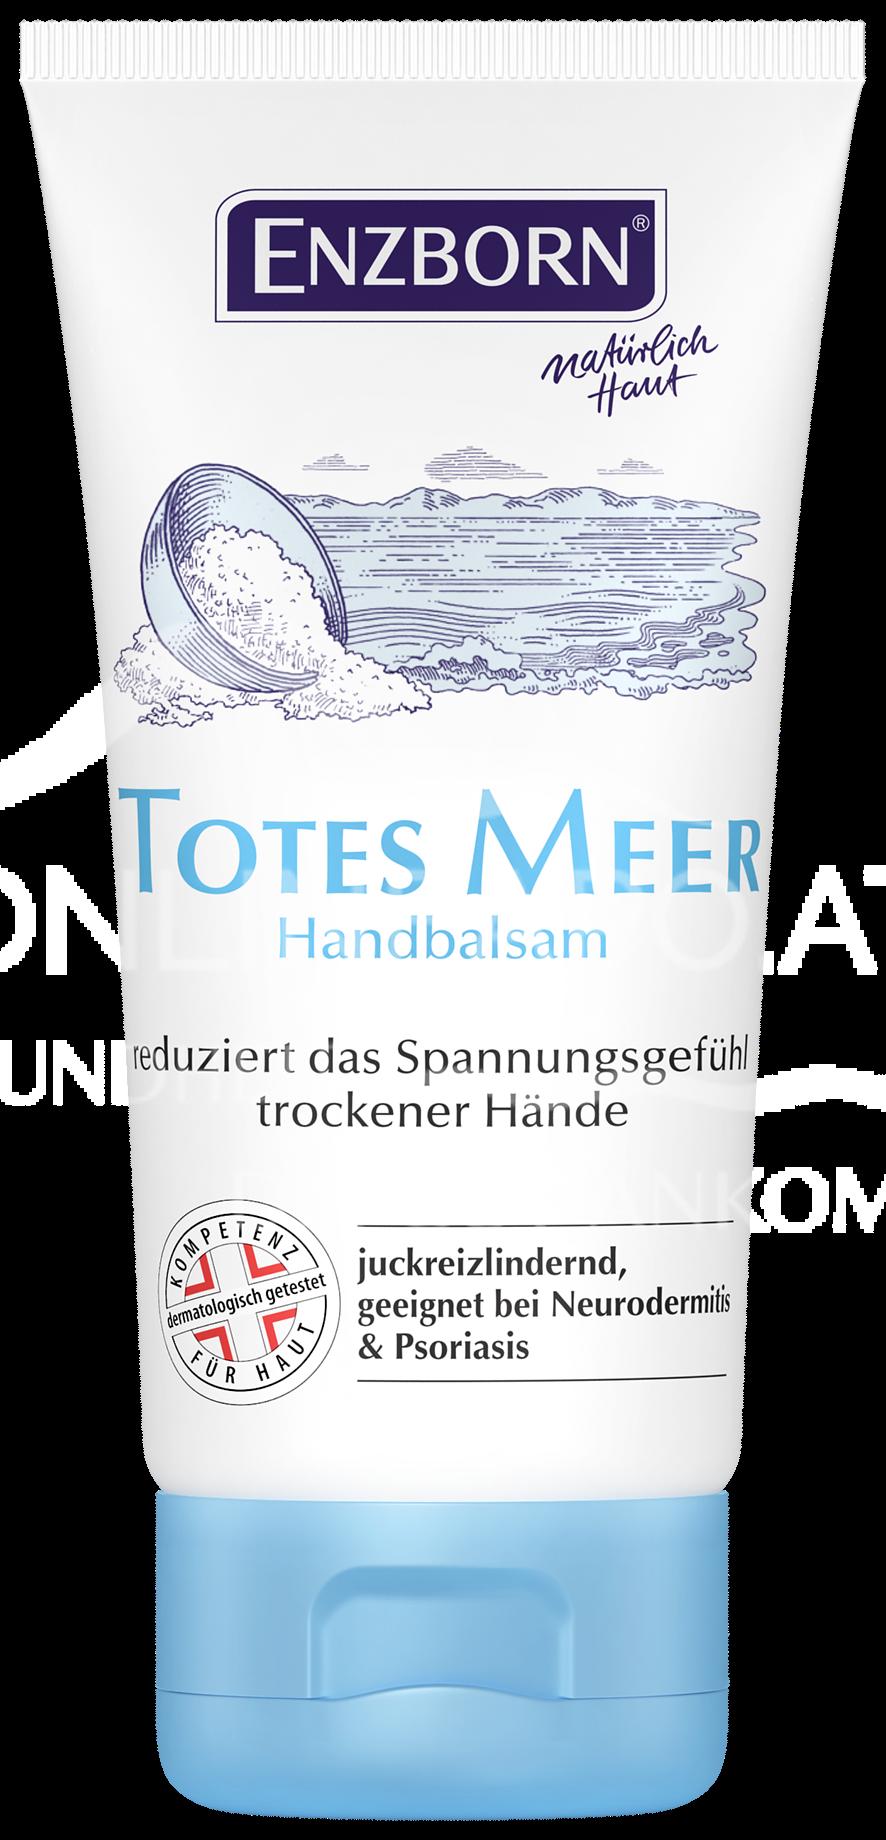 Enzborn Totes Meer Handbalsam